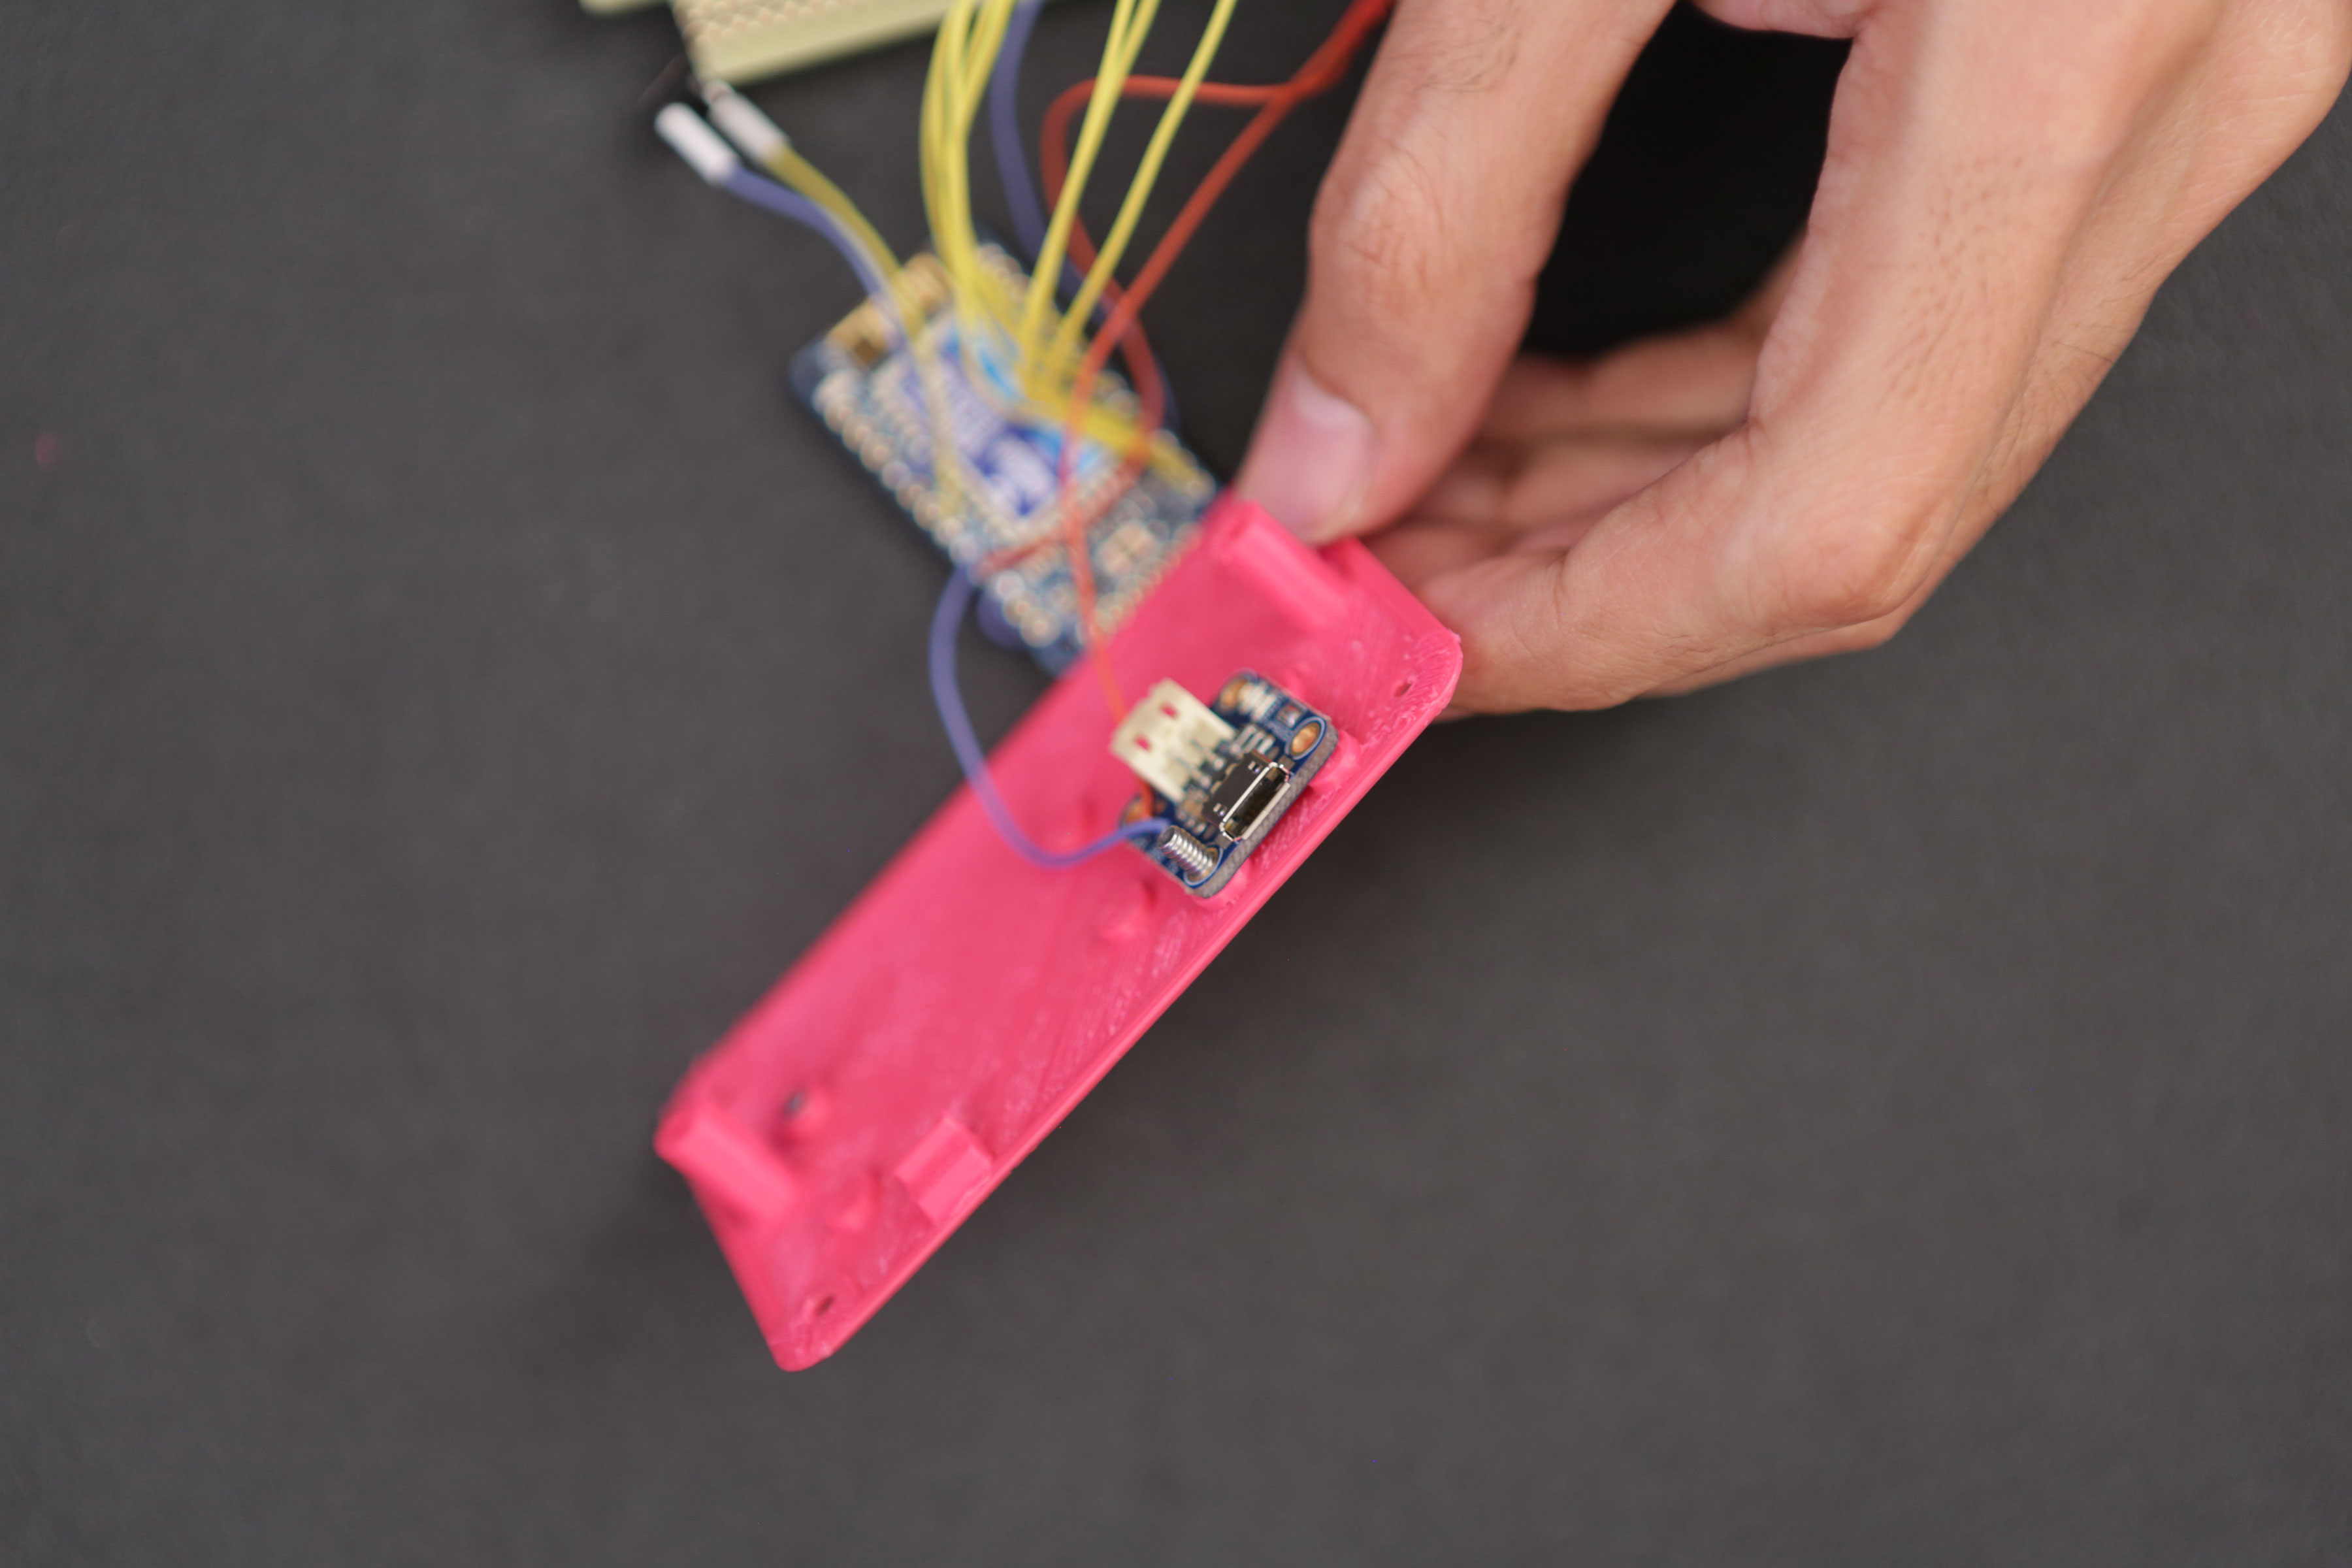 gaming_charger-mounted.jpg